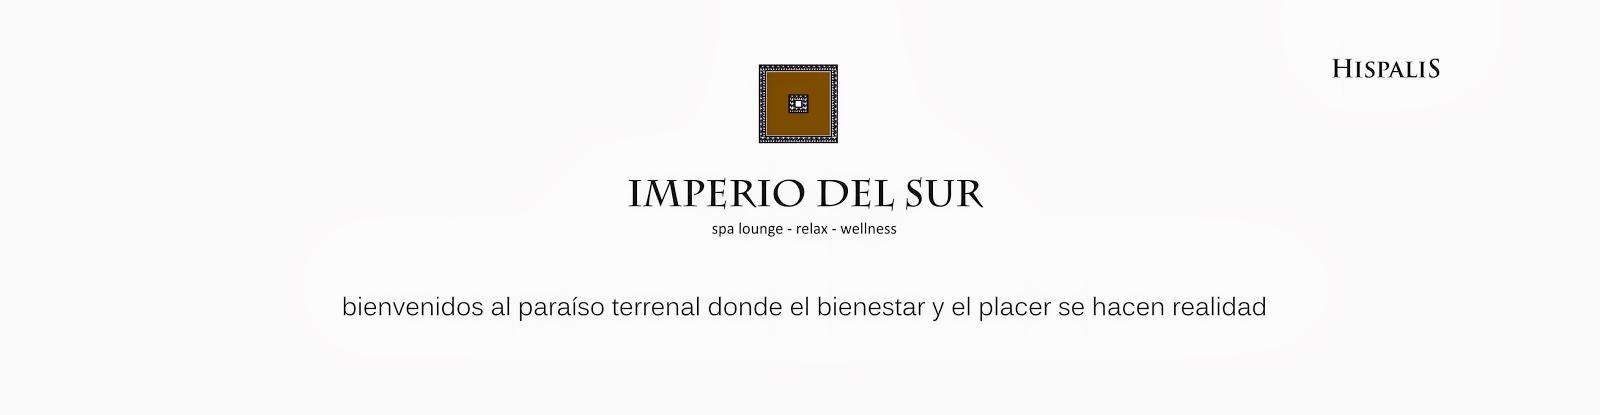 Imperio del Sur Sevilla